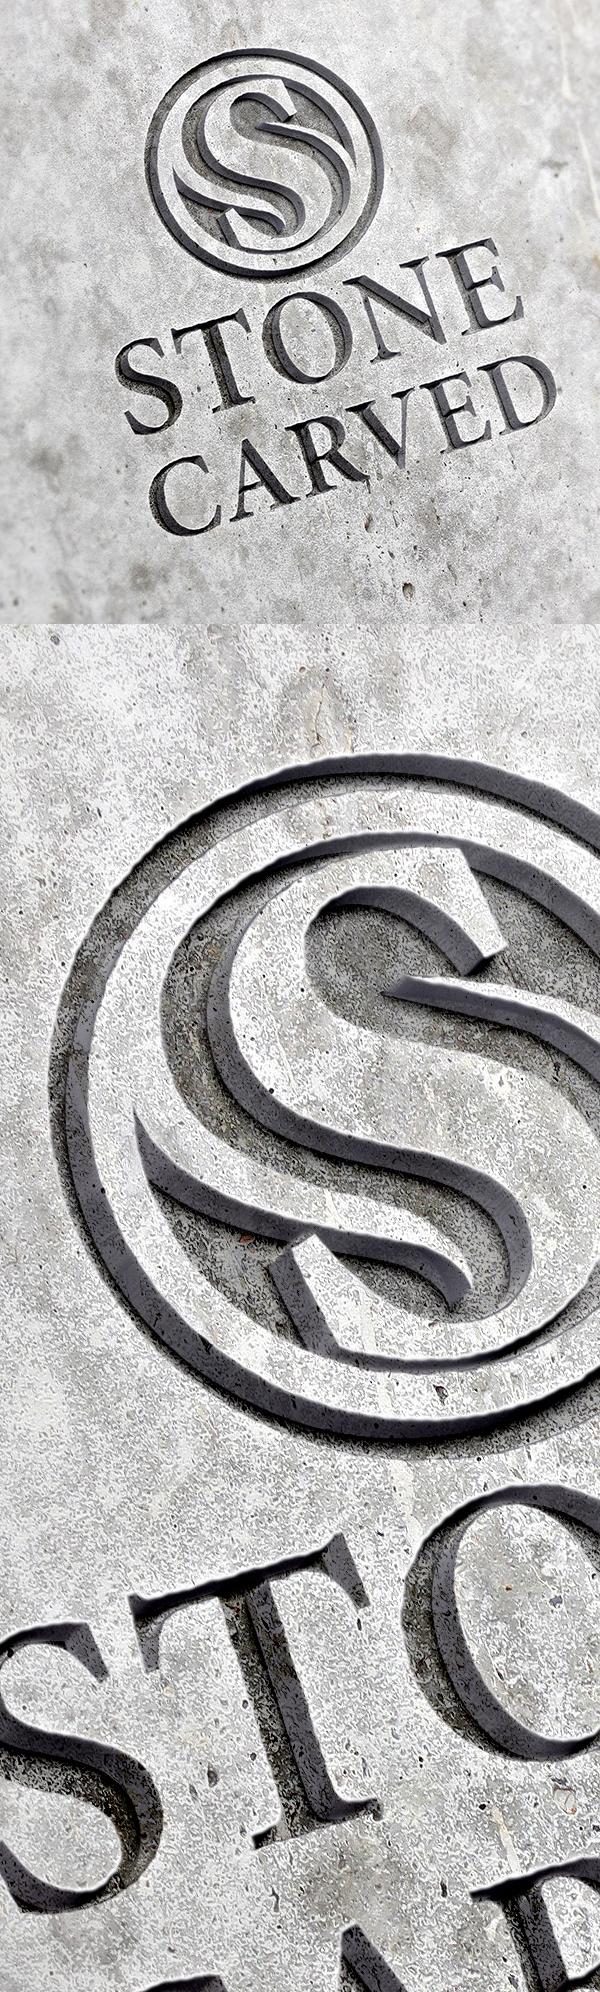 Free Carved Stone Logo Mockup PSD